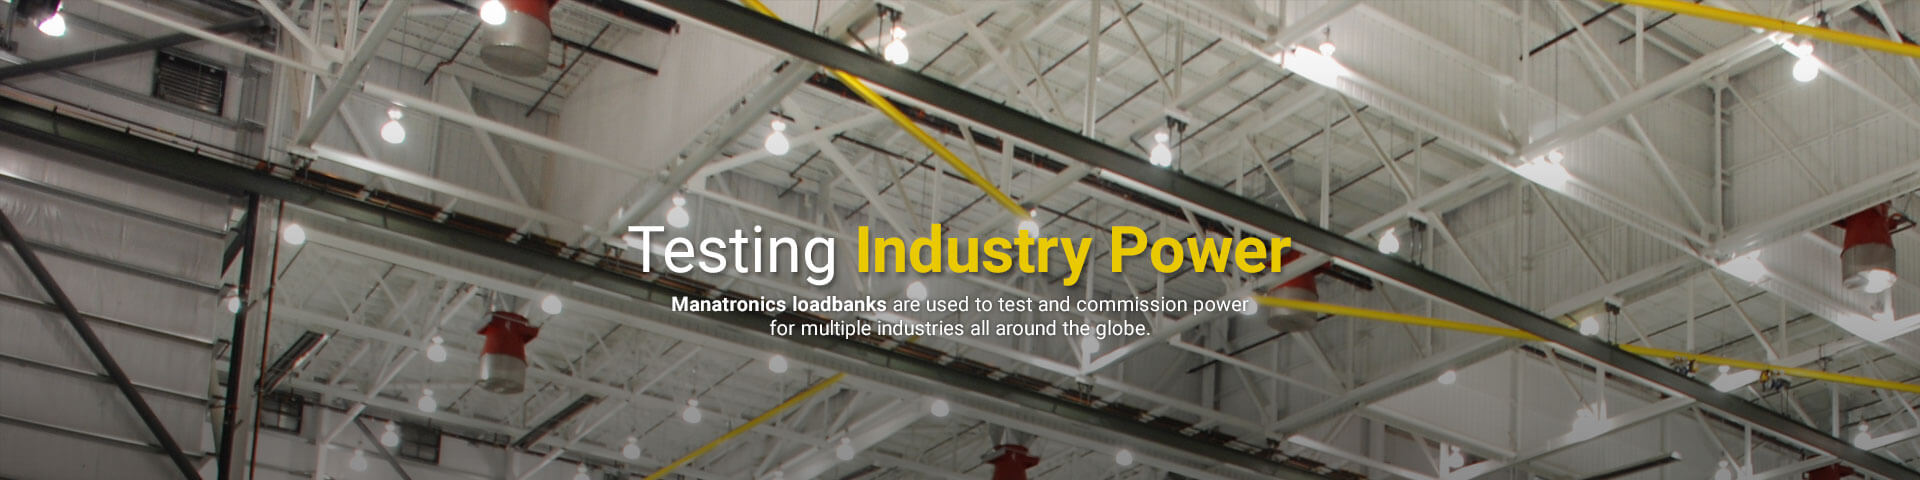 testing-industry-power